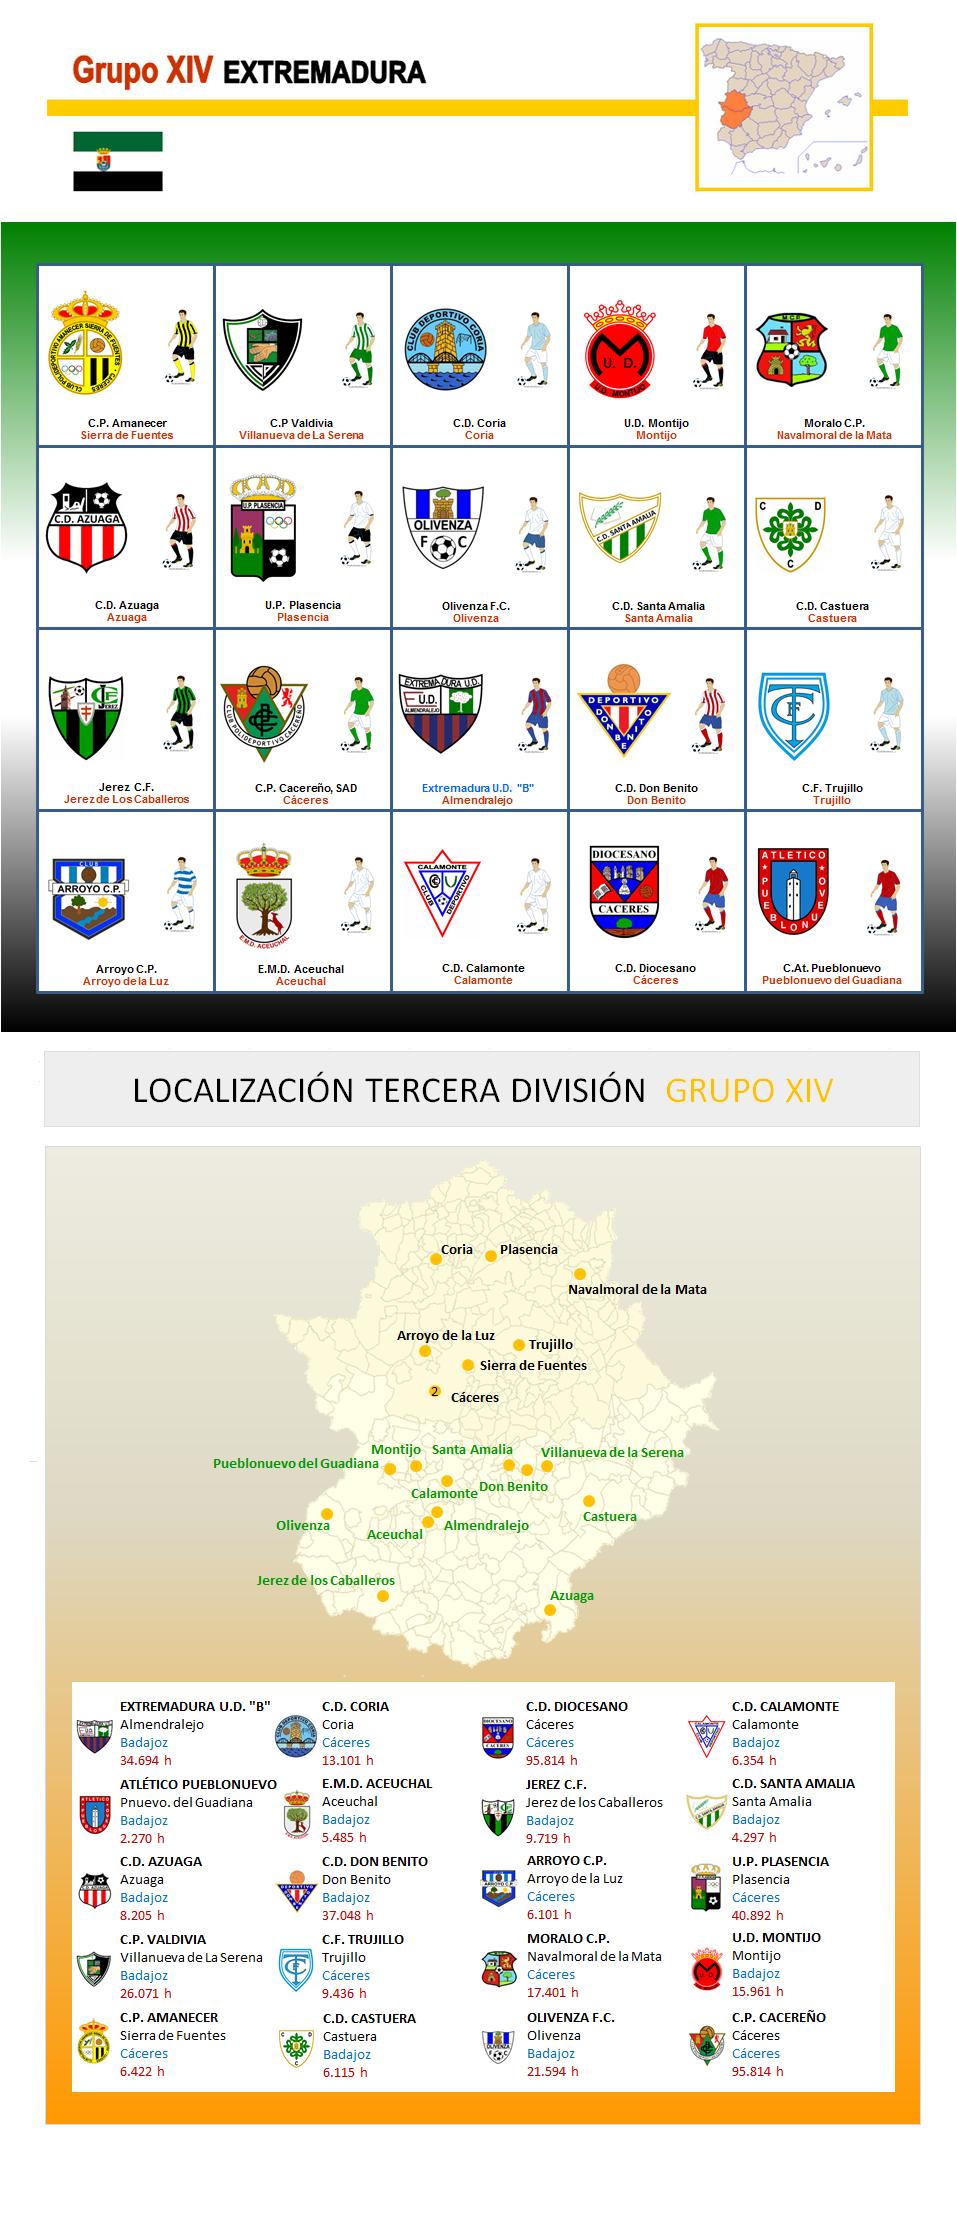 tercera division grupo 14 extremadura